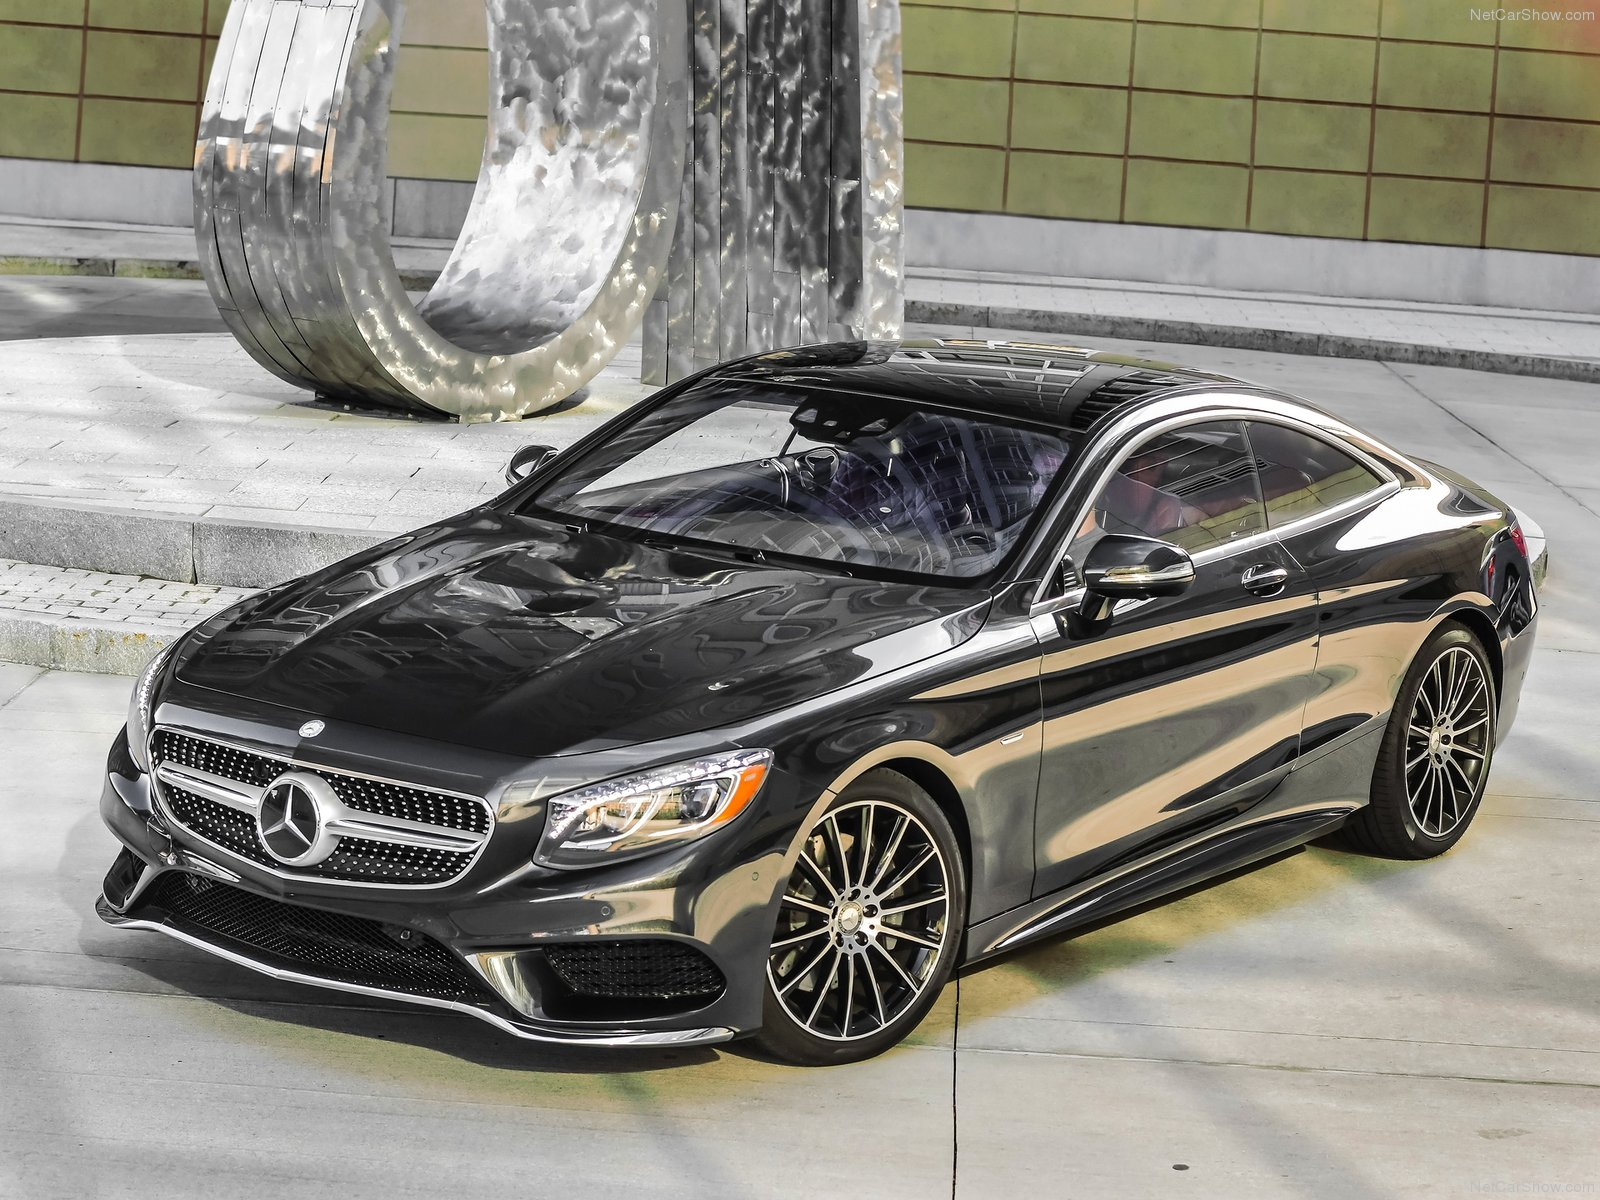 Mercedes benz s550 coupe picture 130858 mercedes benz for Mercedes benz s550 sedan